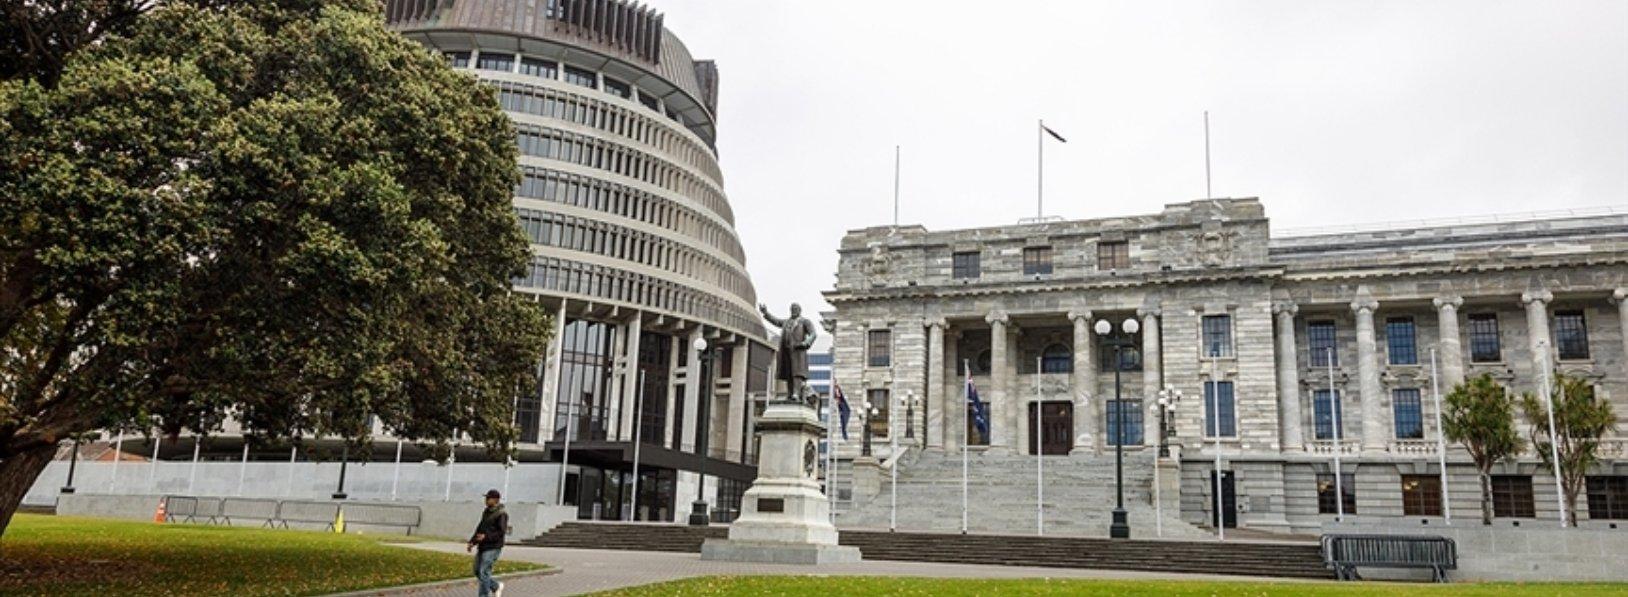 Covid-19 vaccine certificate period is beginning in New Zealand.